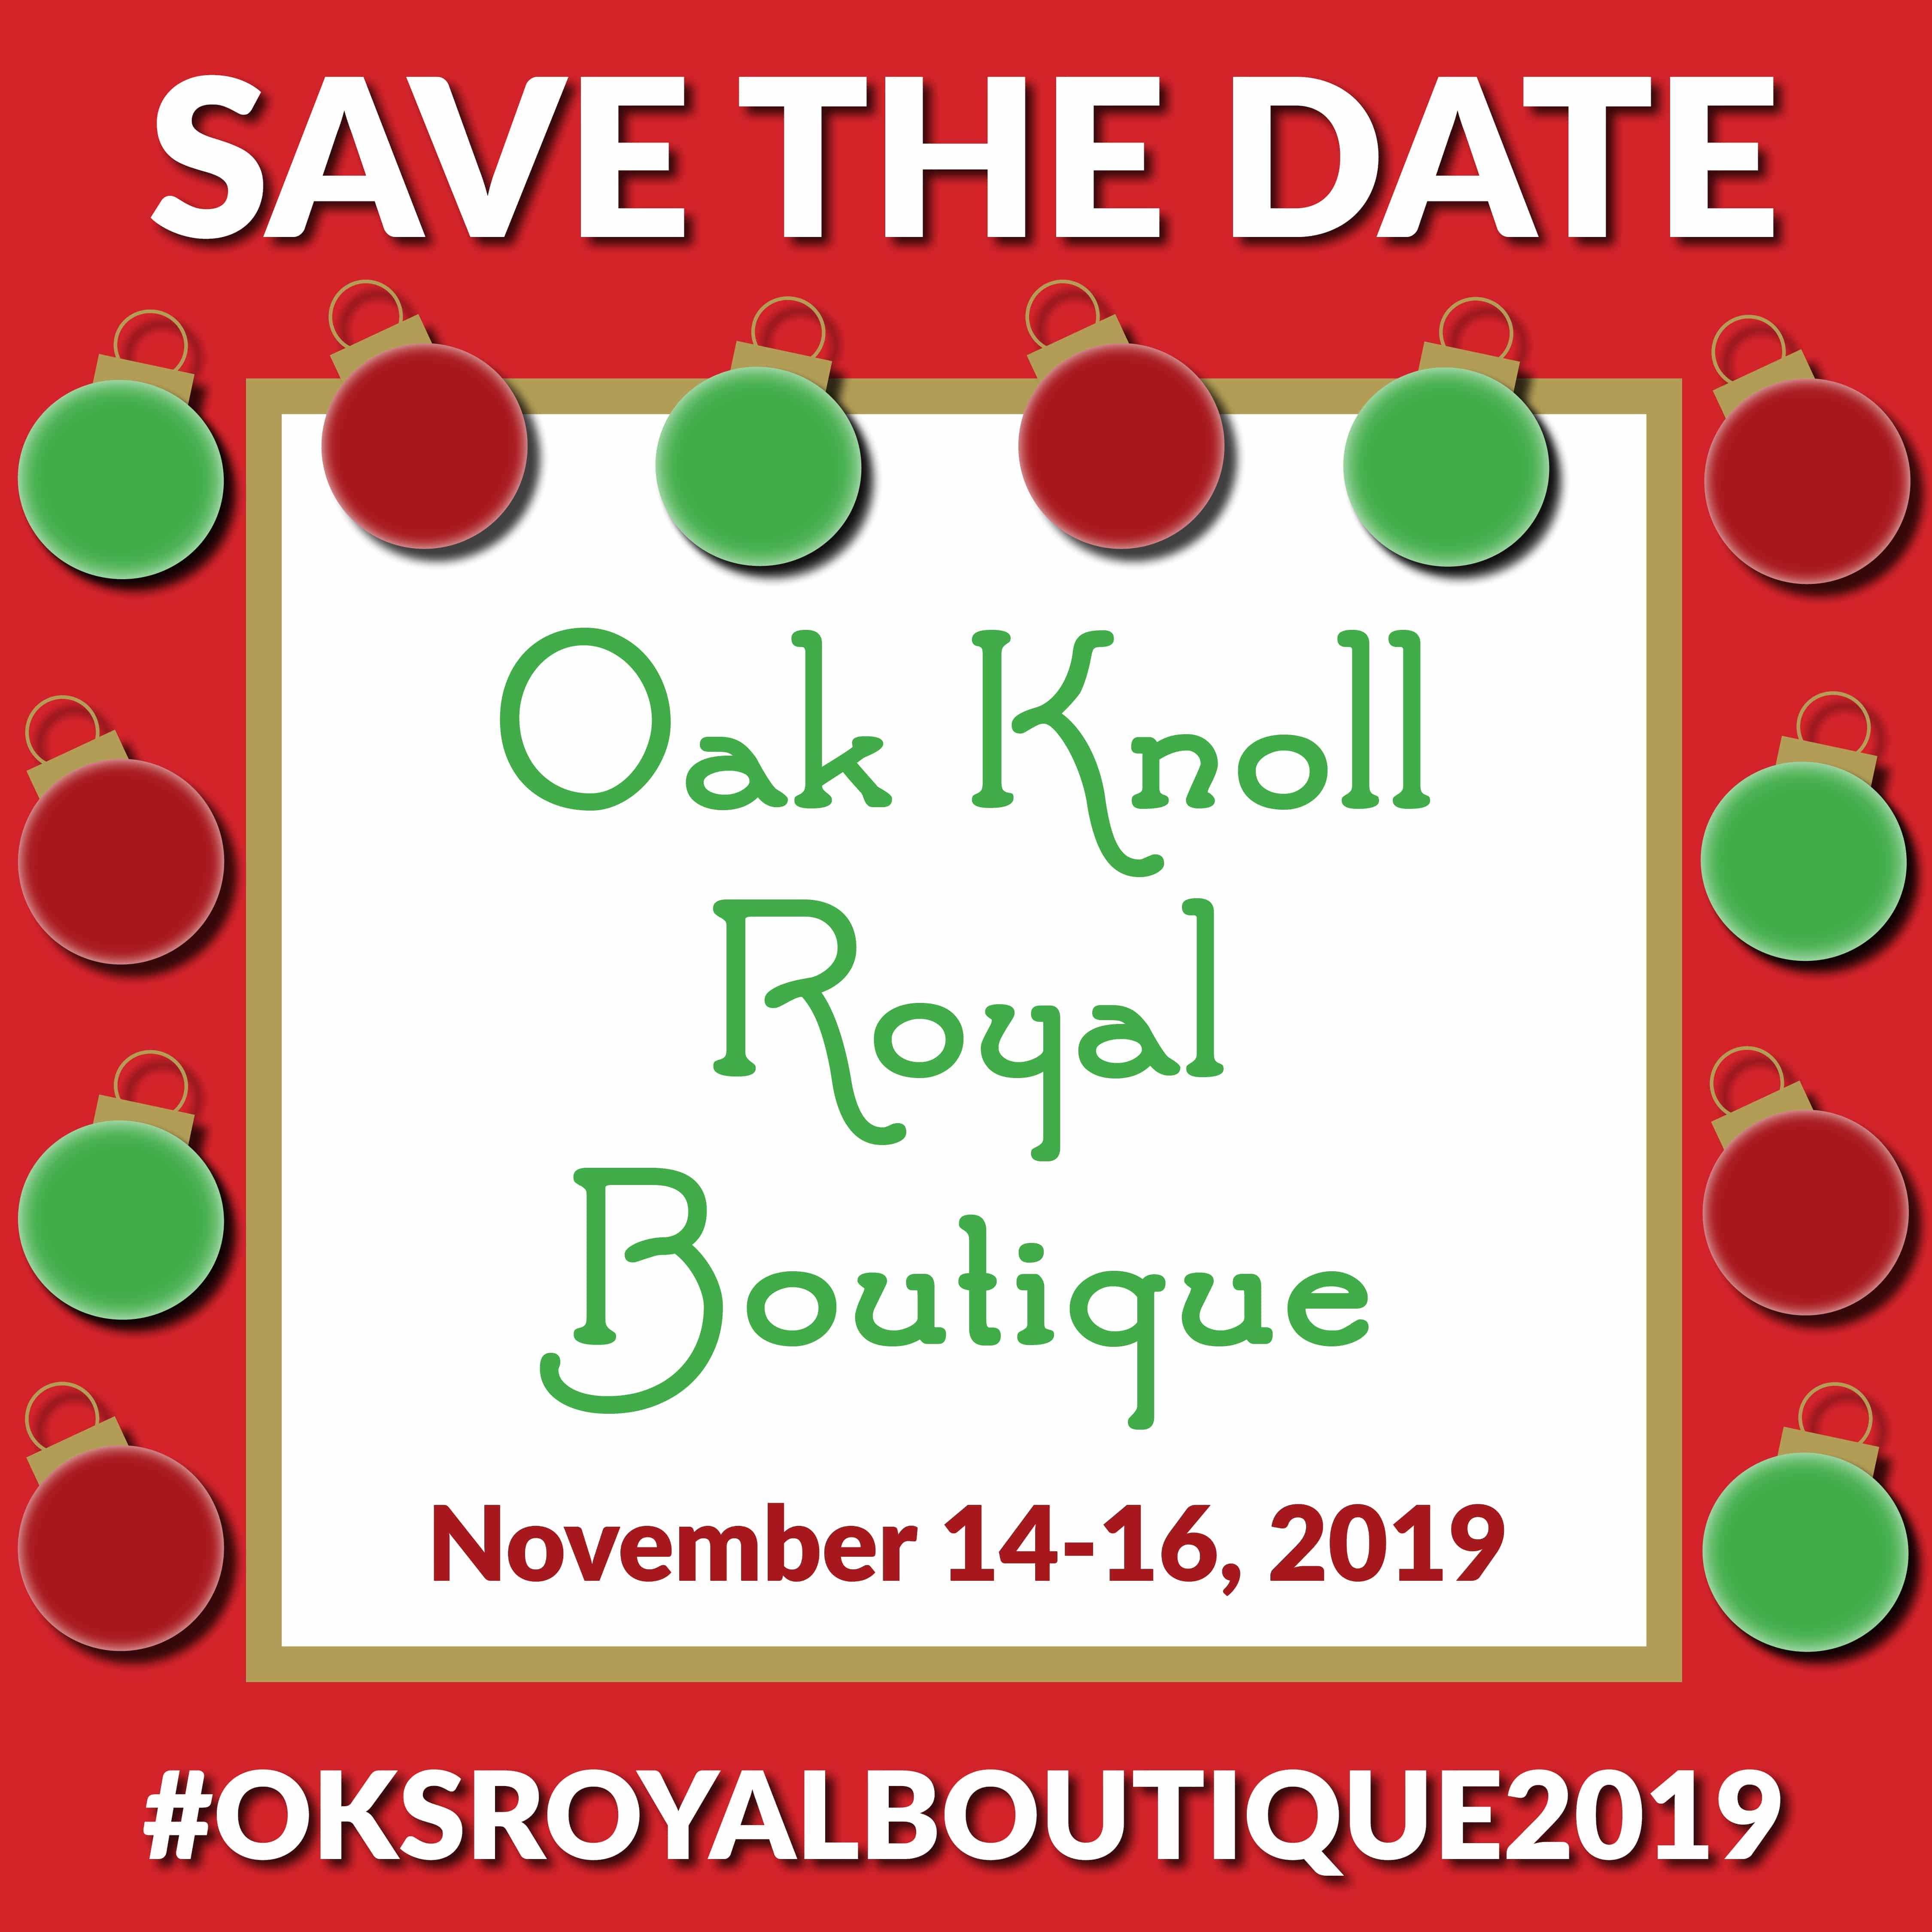 Royal Boutique Instagram image